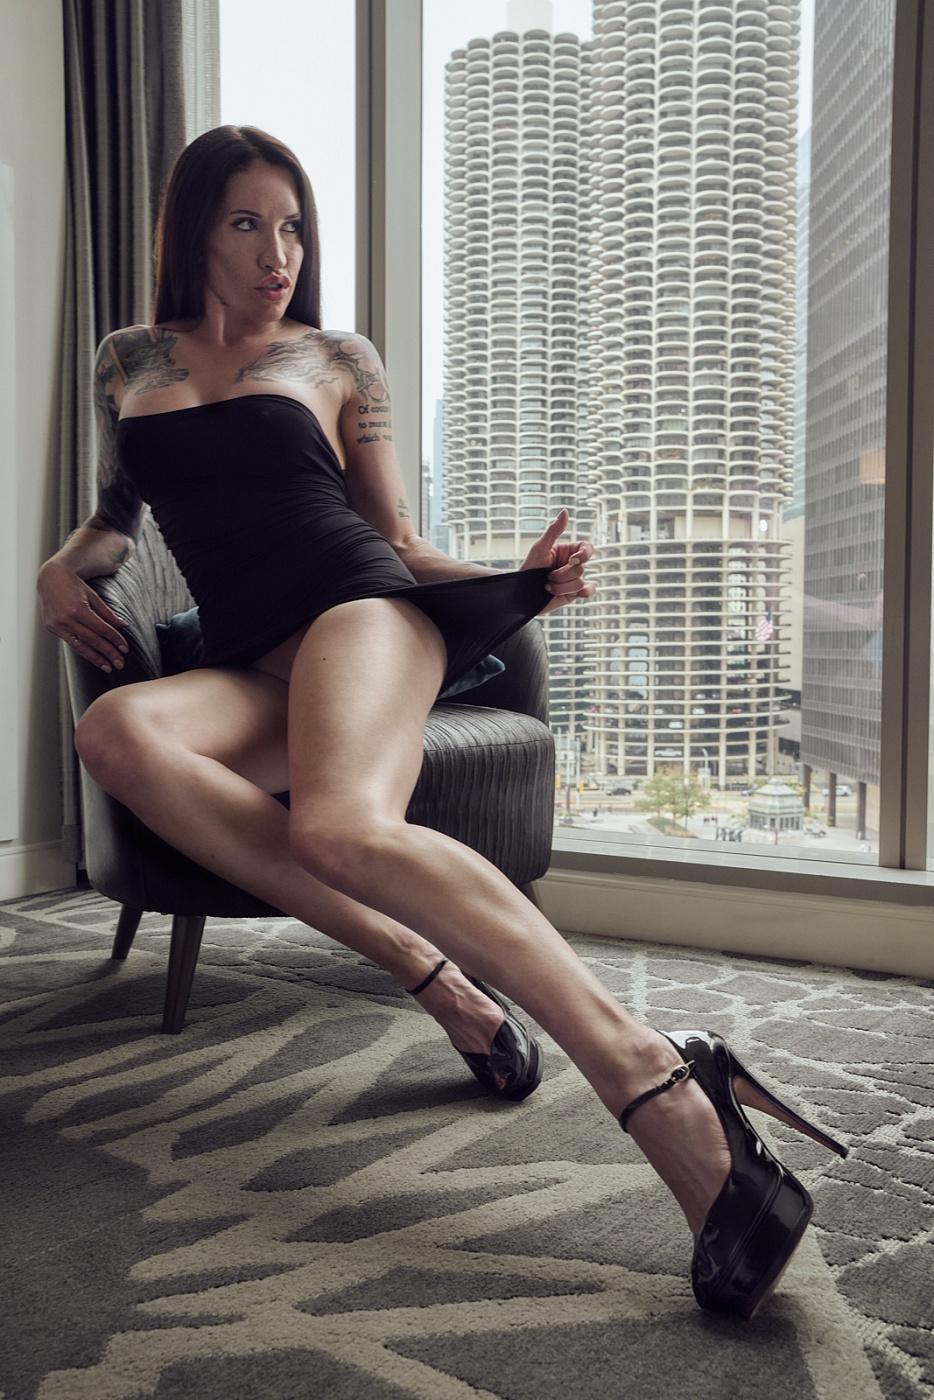 Alyx of Chicago